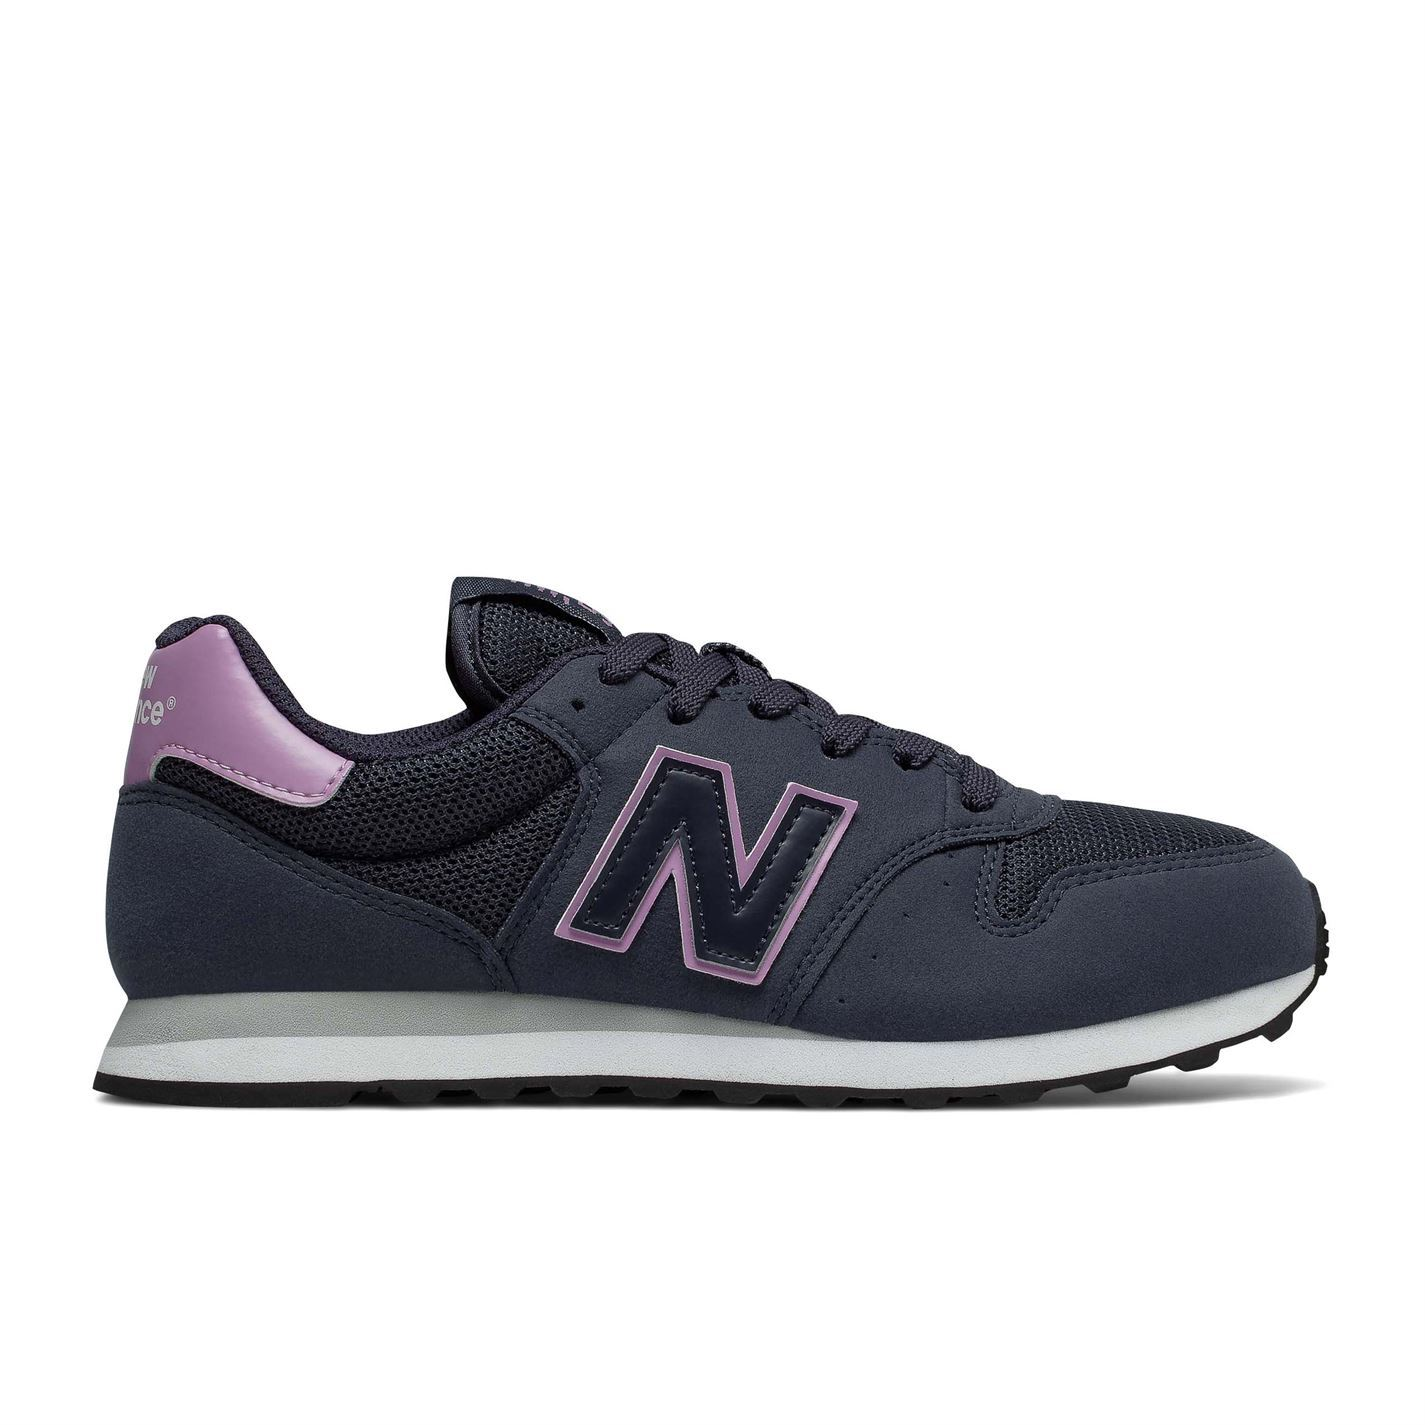 Damenschuhe Damenschuhe Damenschuhe New Balance Bal 500 Runners New 0972ef